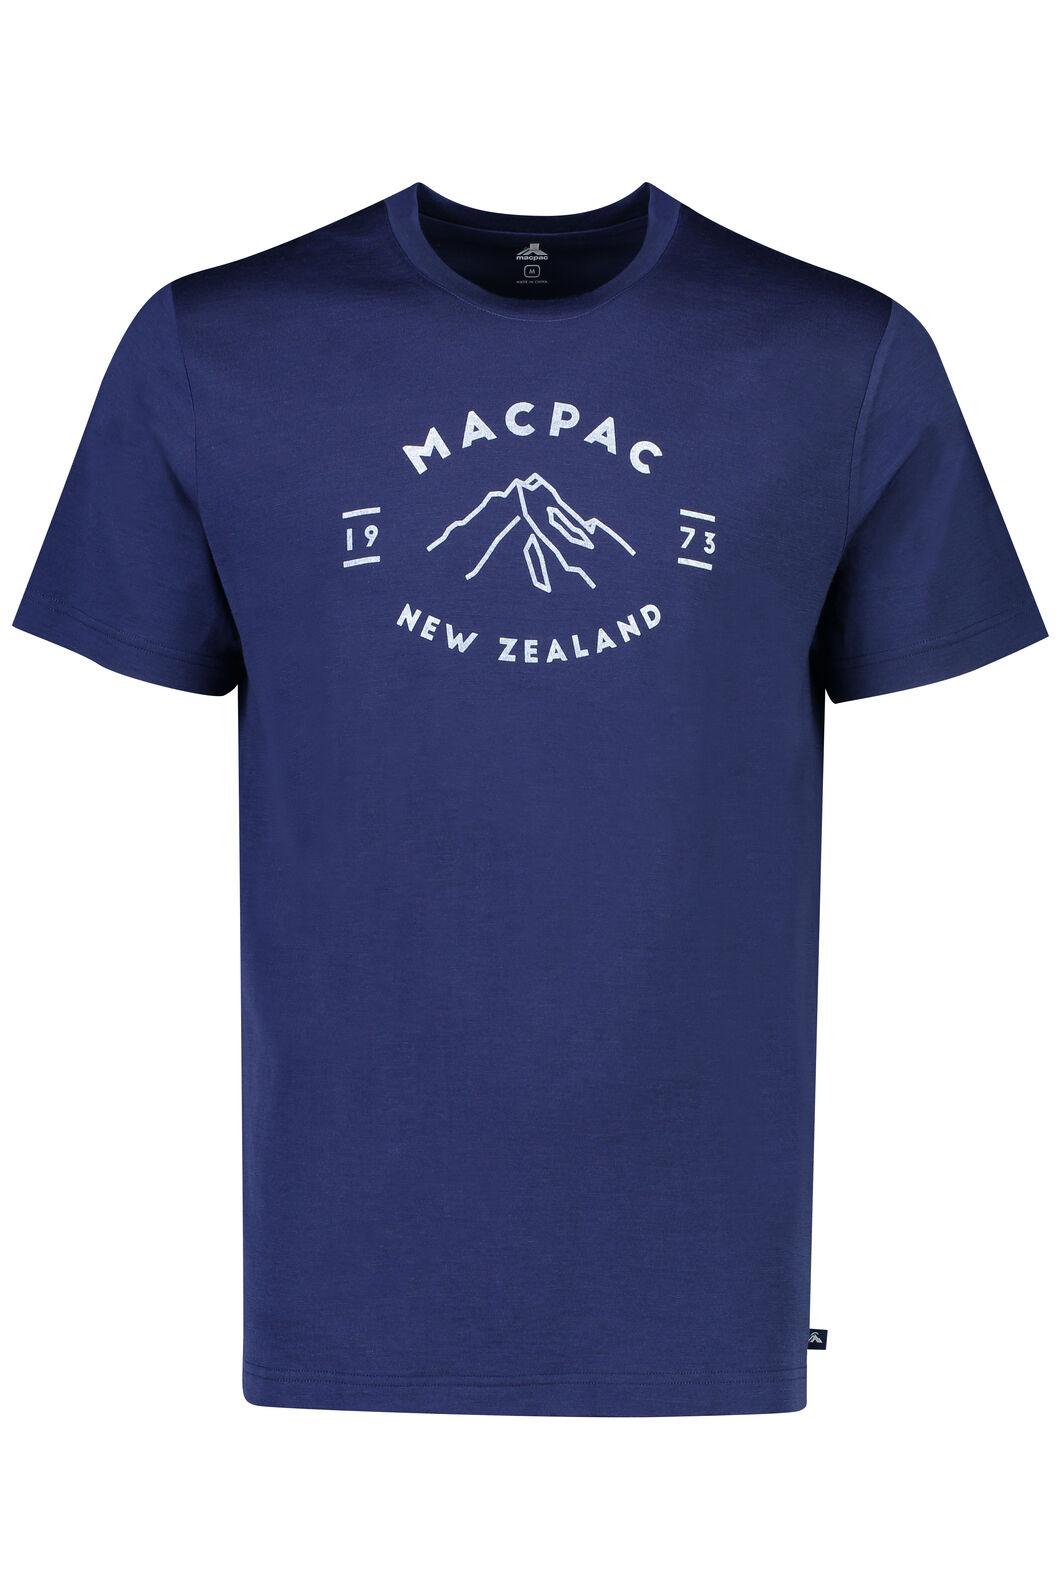 Macpac Mountain  Merino 180 Tee - Men's, Medieval Blue, hi-res